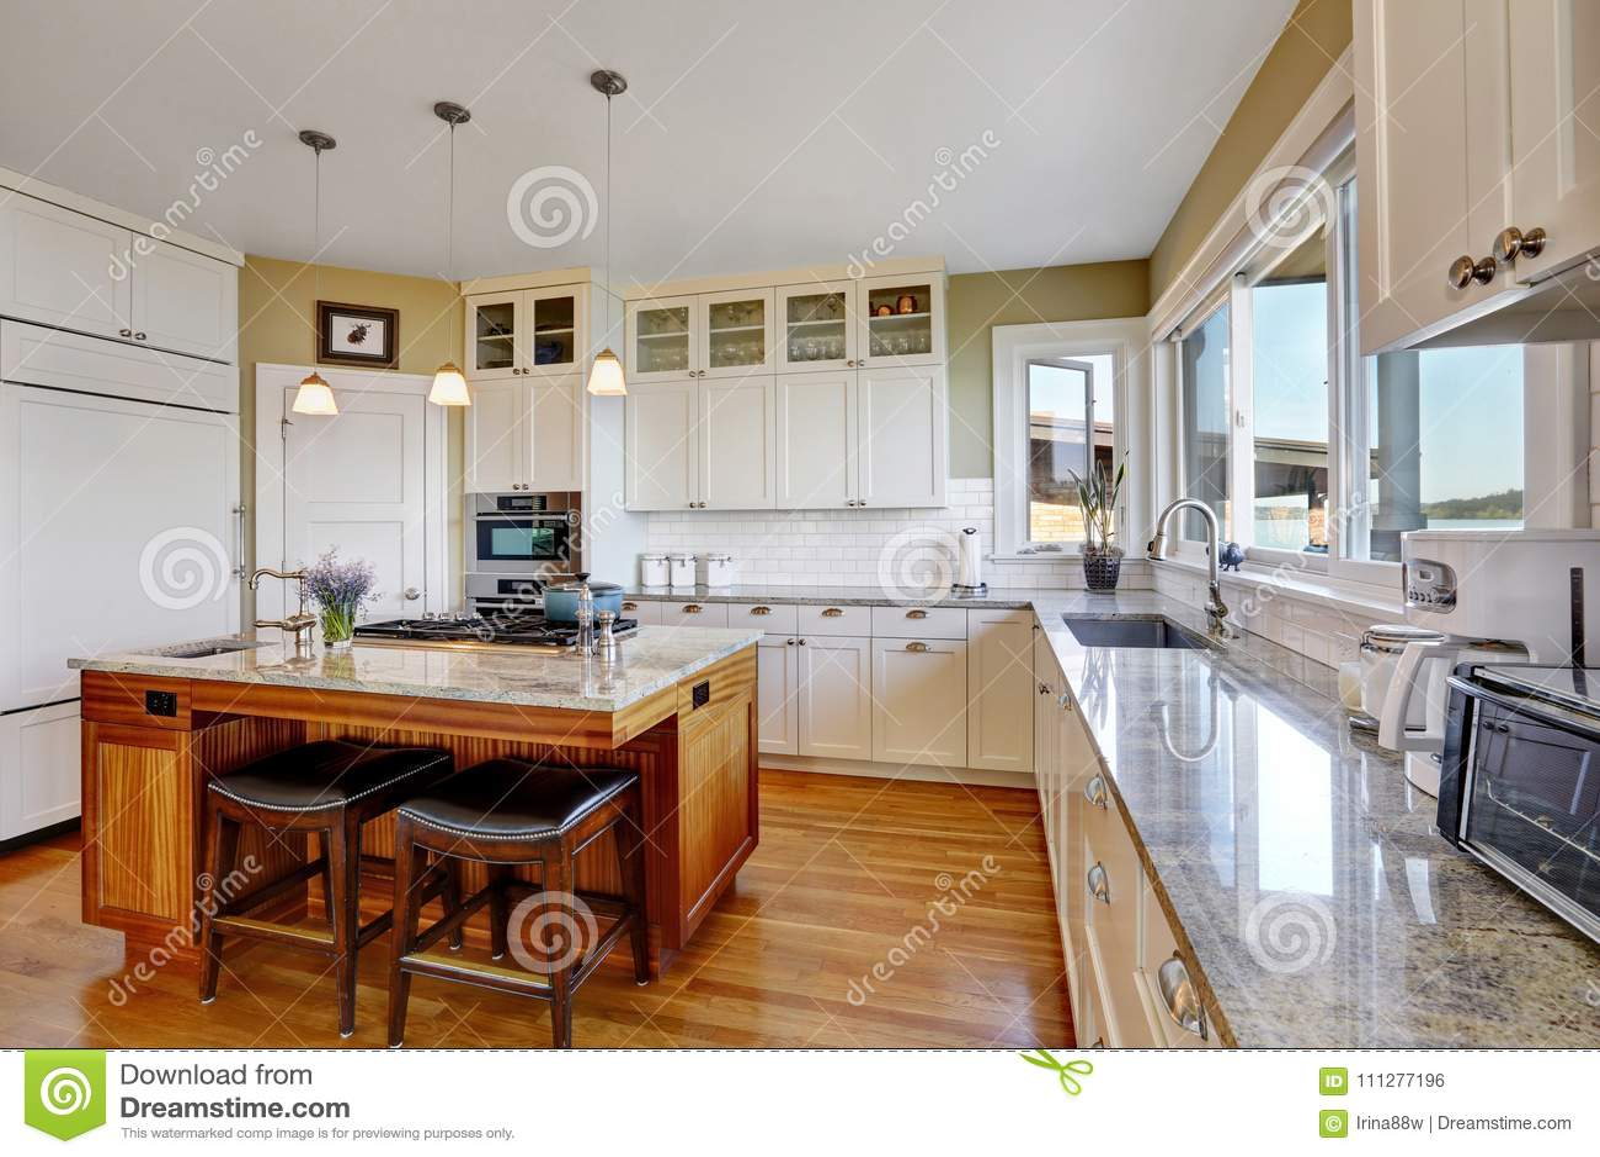 white kitchen cabinets best countertops for kitchens 有纯净的白色厨柜的惊人的白色厨房库存照片 图片包括有设计 灌肠器 有纯净的白色厨柜的惊人的白色厨房